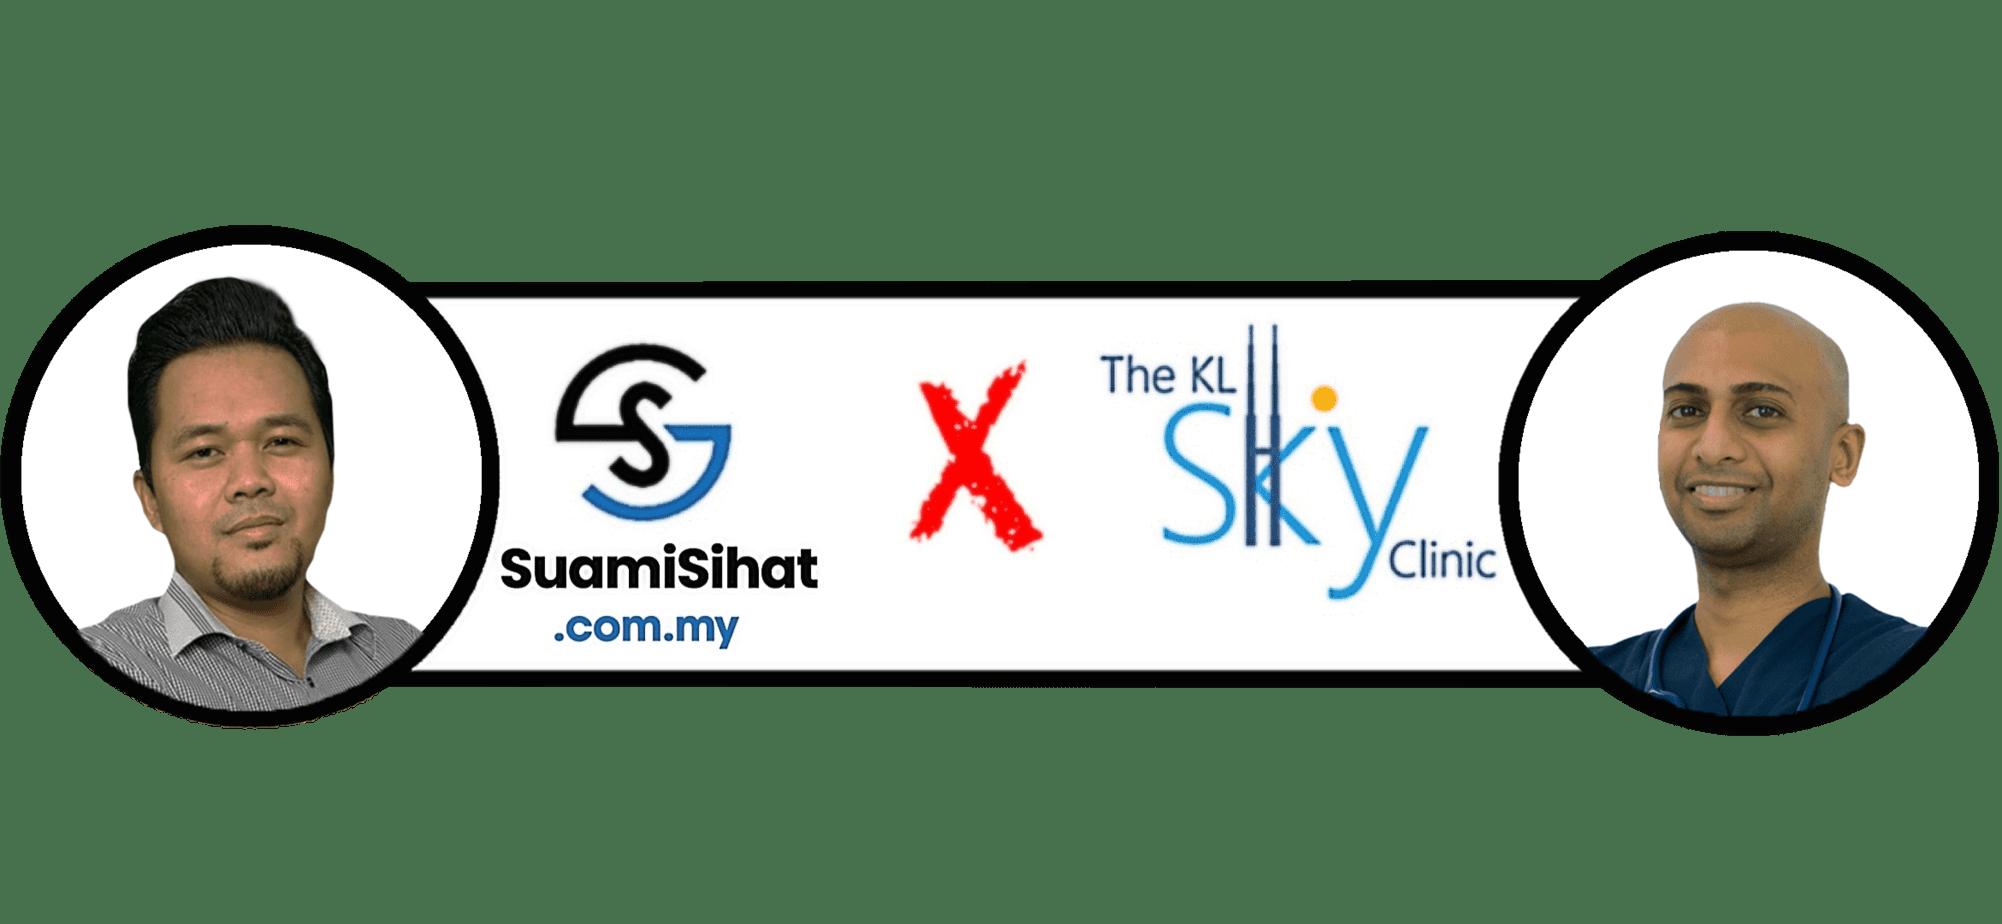 KL Sky Clinic SuamiSihat